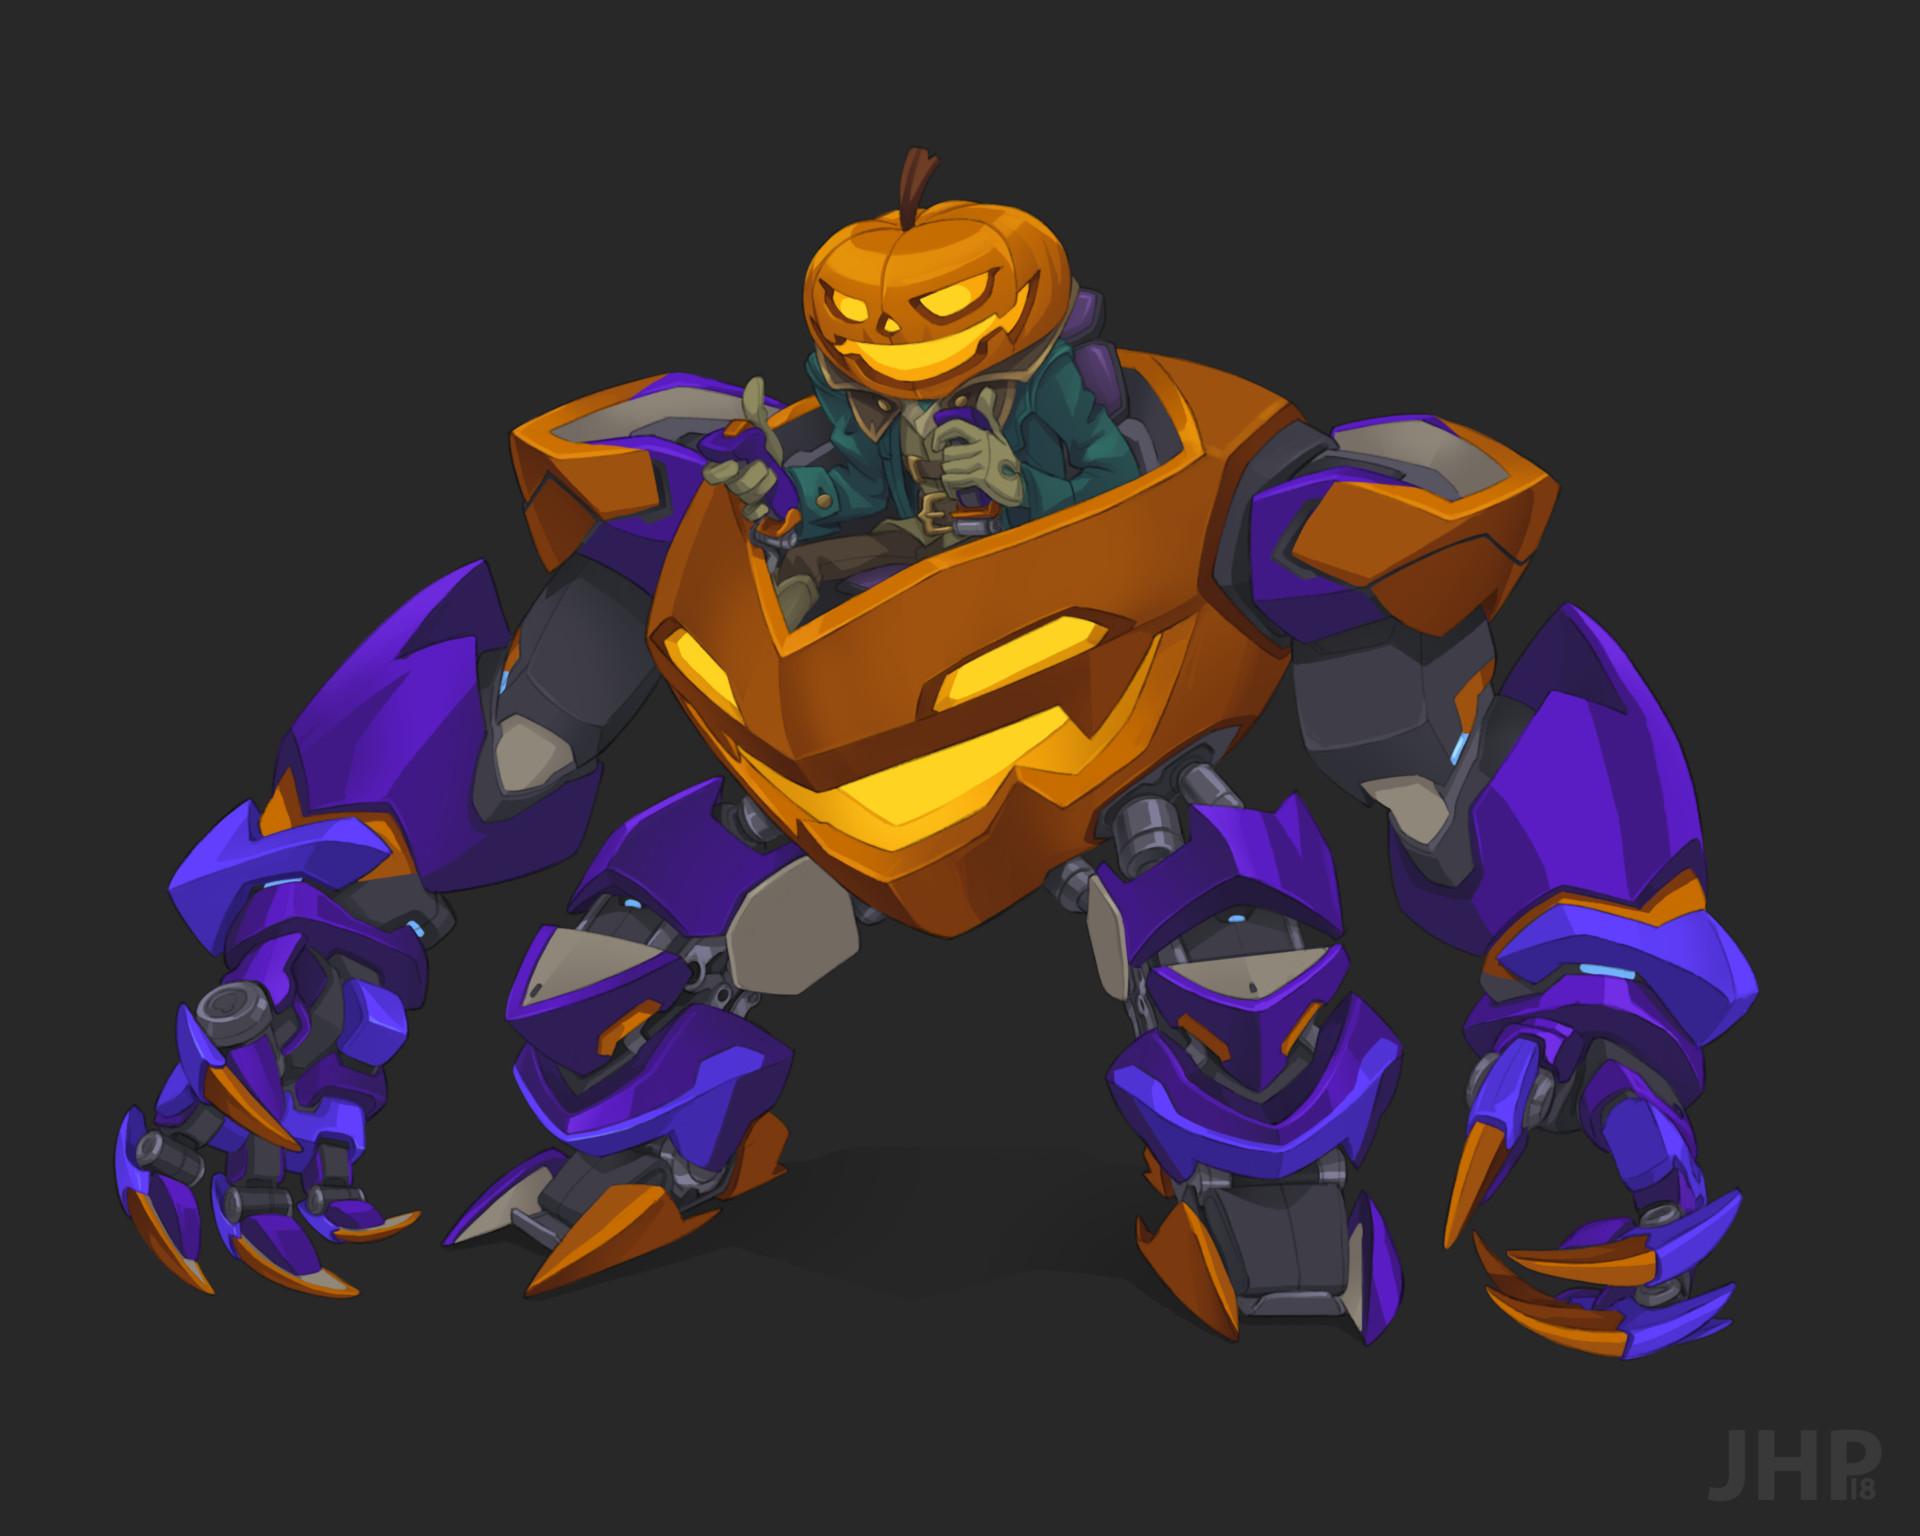 Joao henrique pacheco pumpkinbot